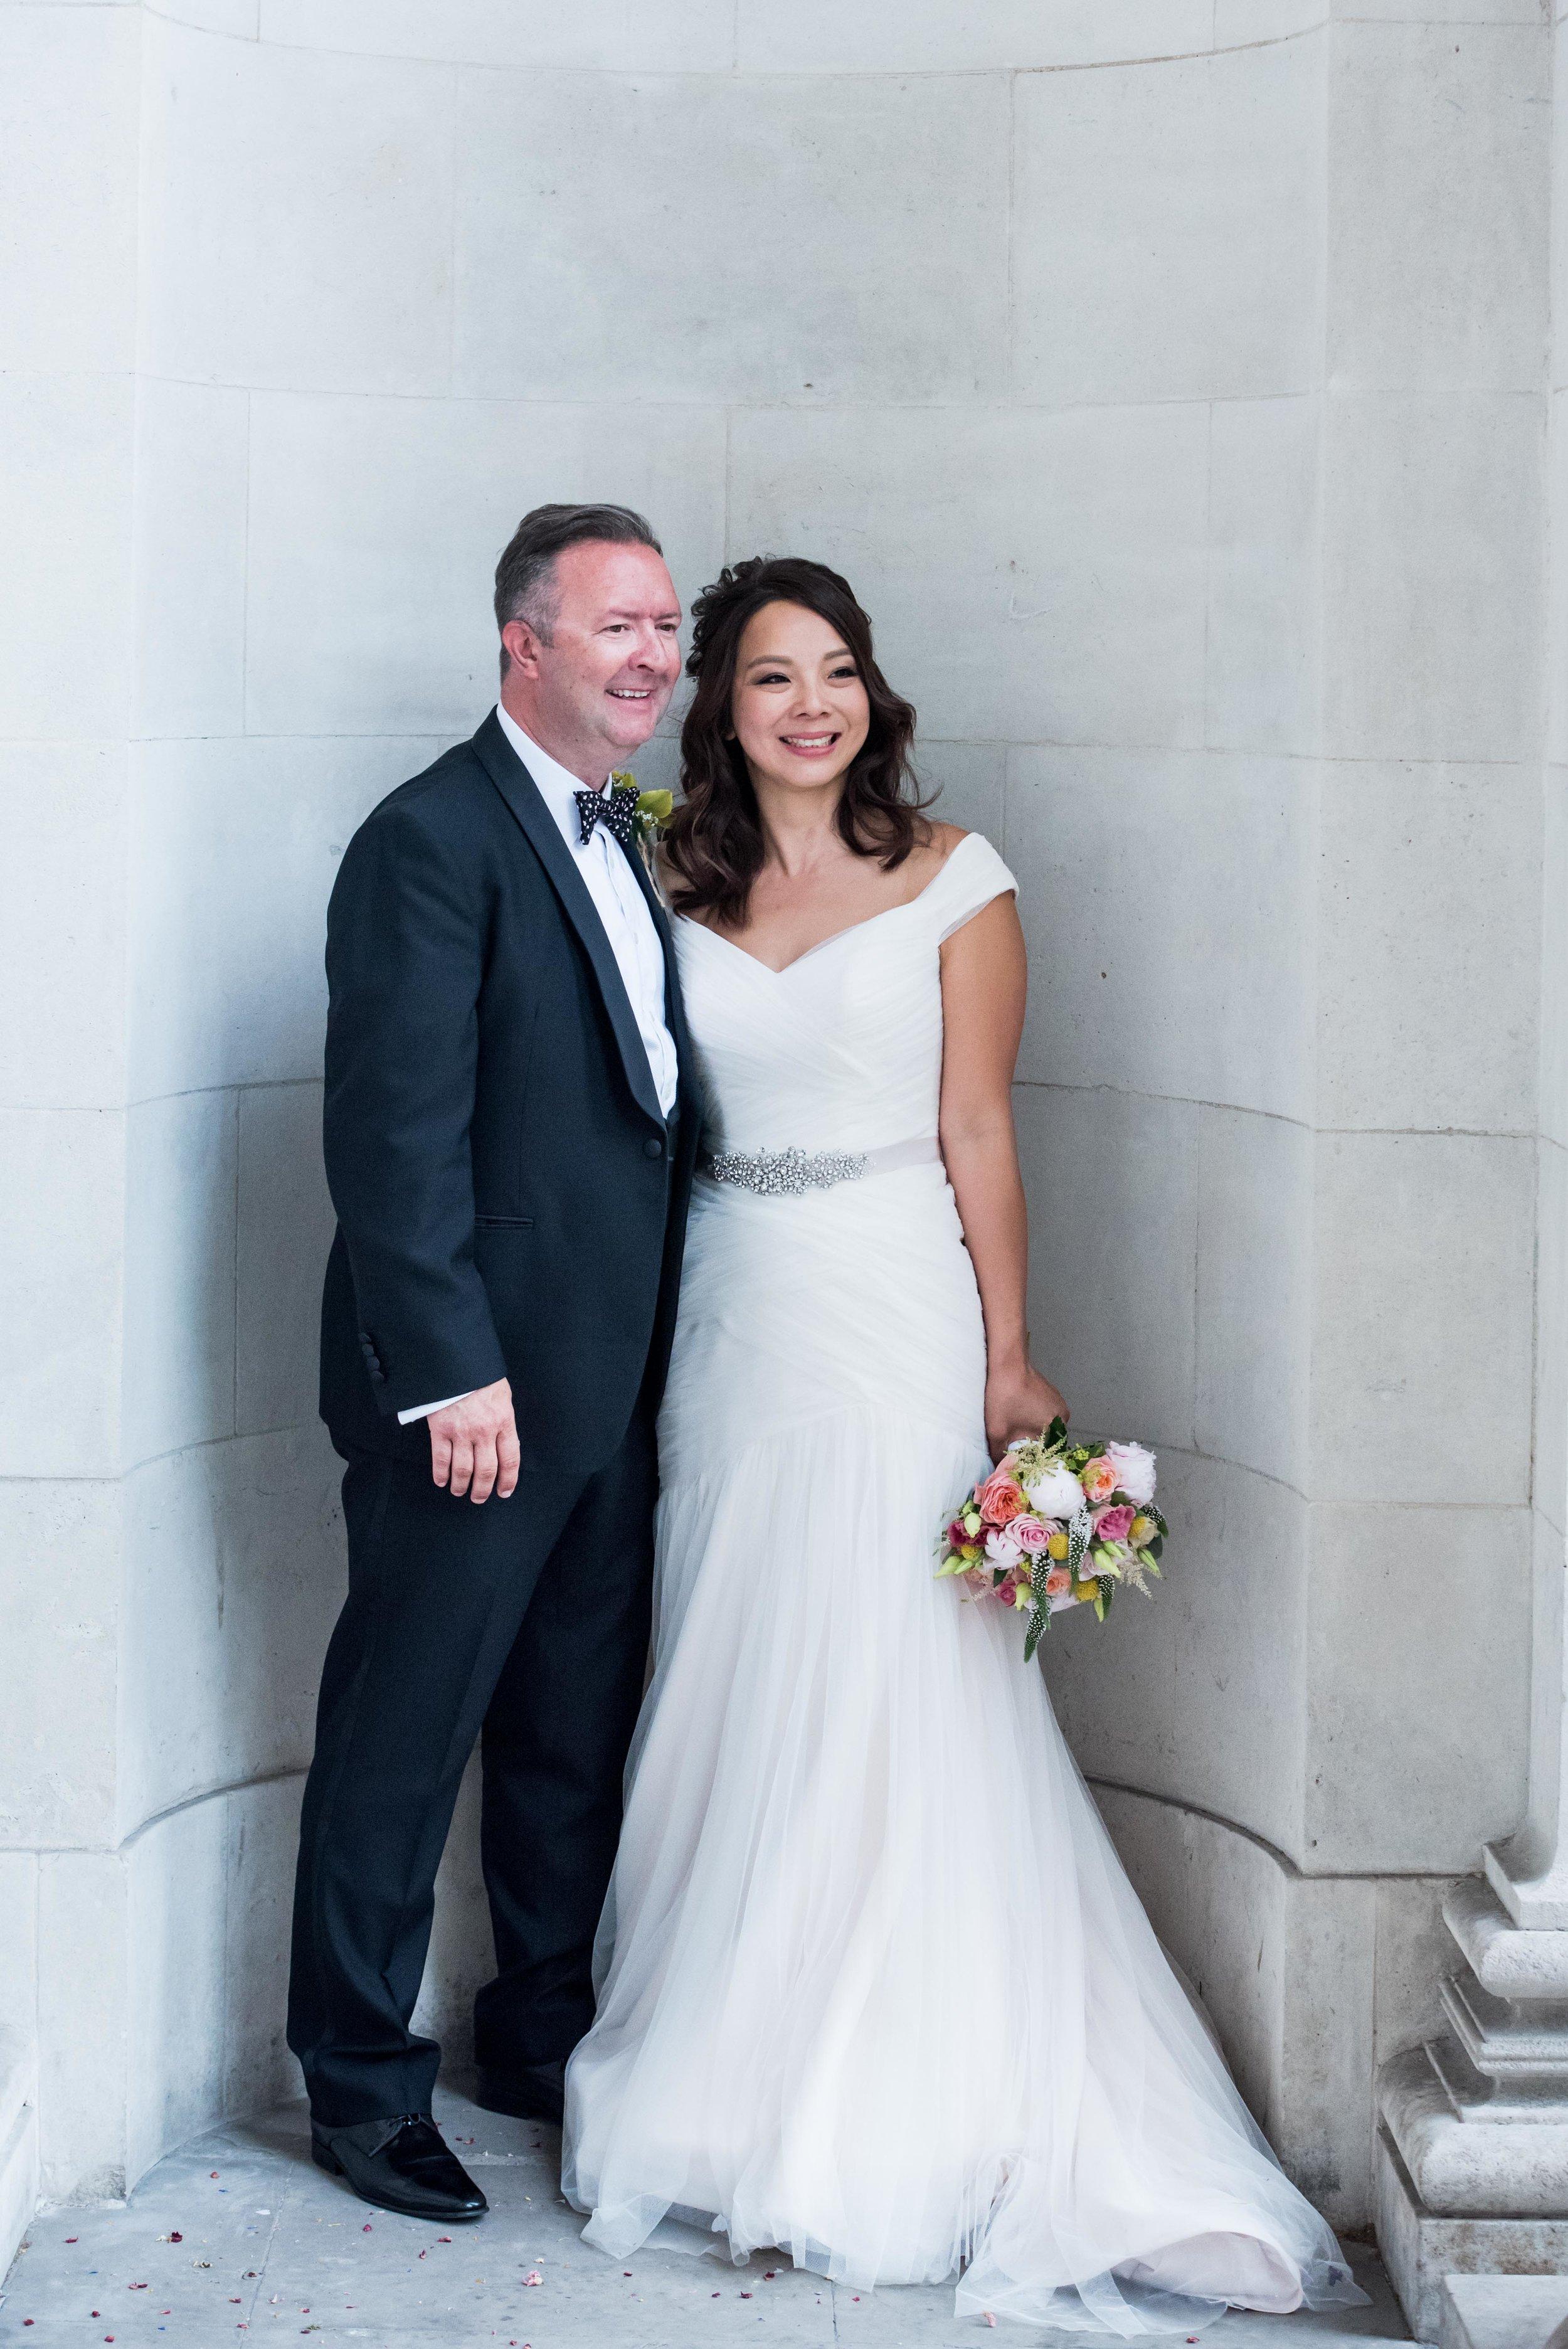 D&M_Marylebone Town Hall Wedding (145 of 239).jpg